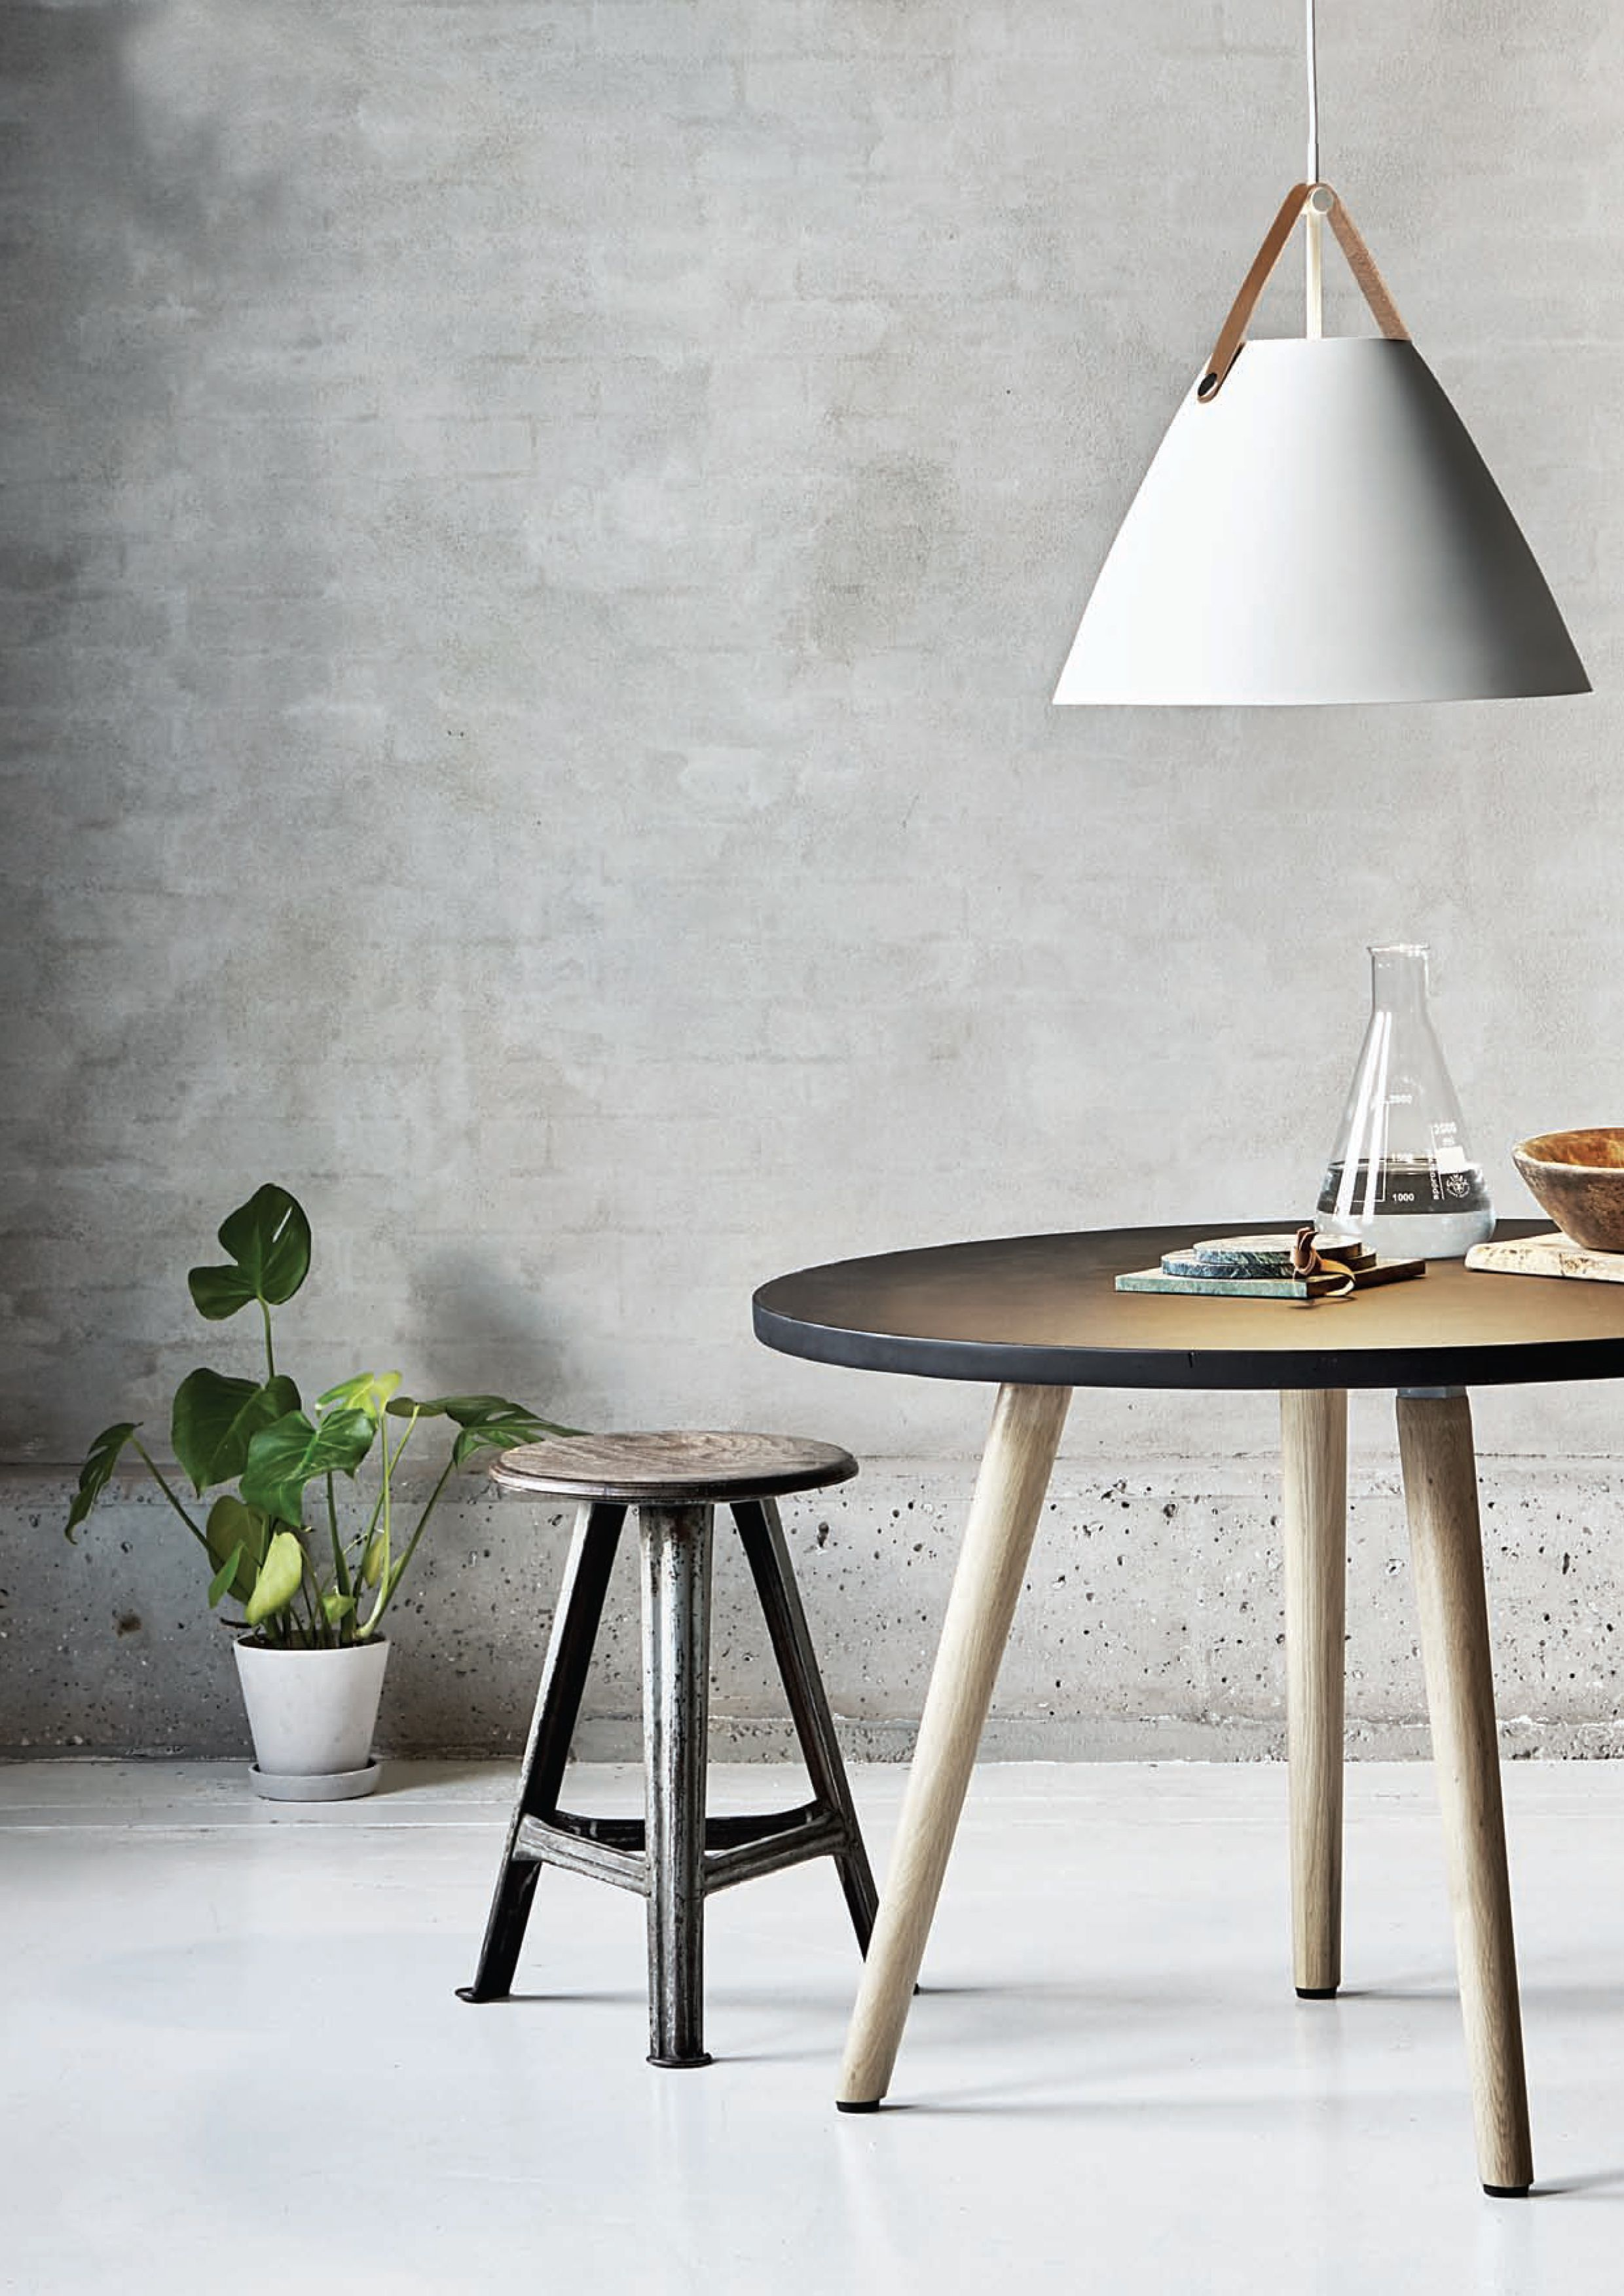 nordic lighting. Metal And Leather Meets Nordic Lighting Design 👌 // Home-of-light. E